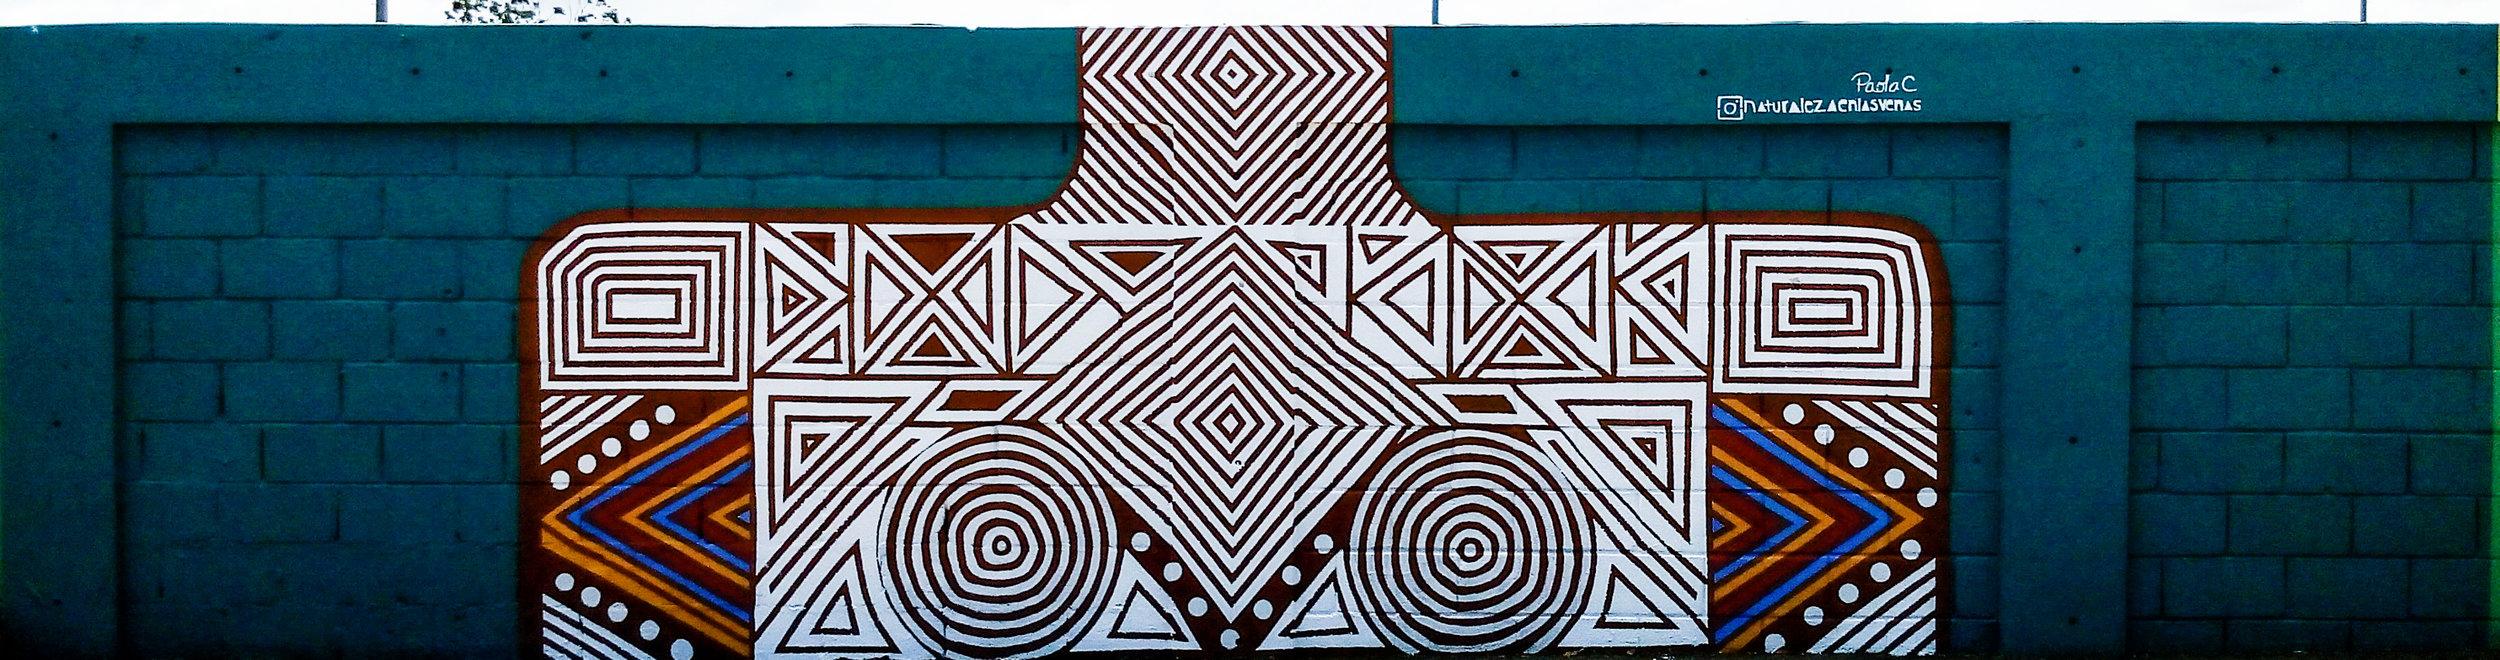 MonumentArt Paola Carrasquillo.jpg